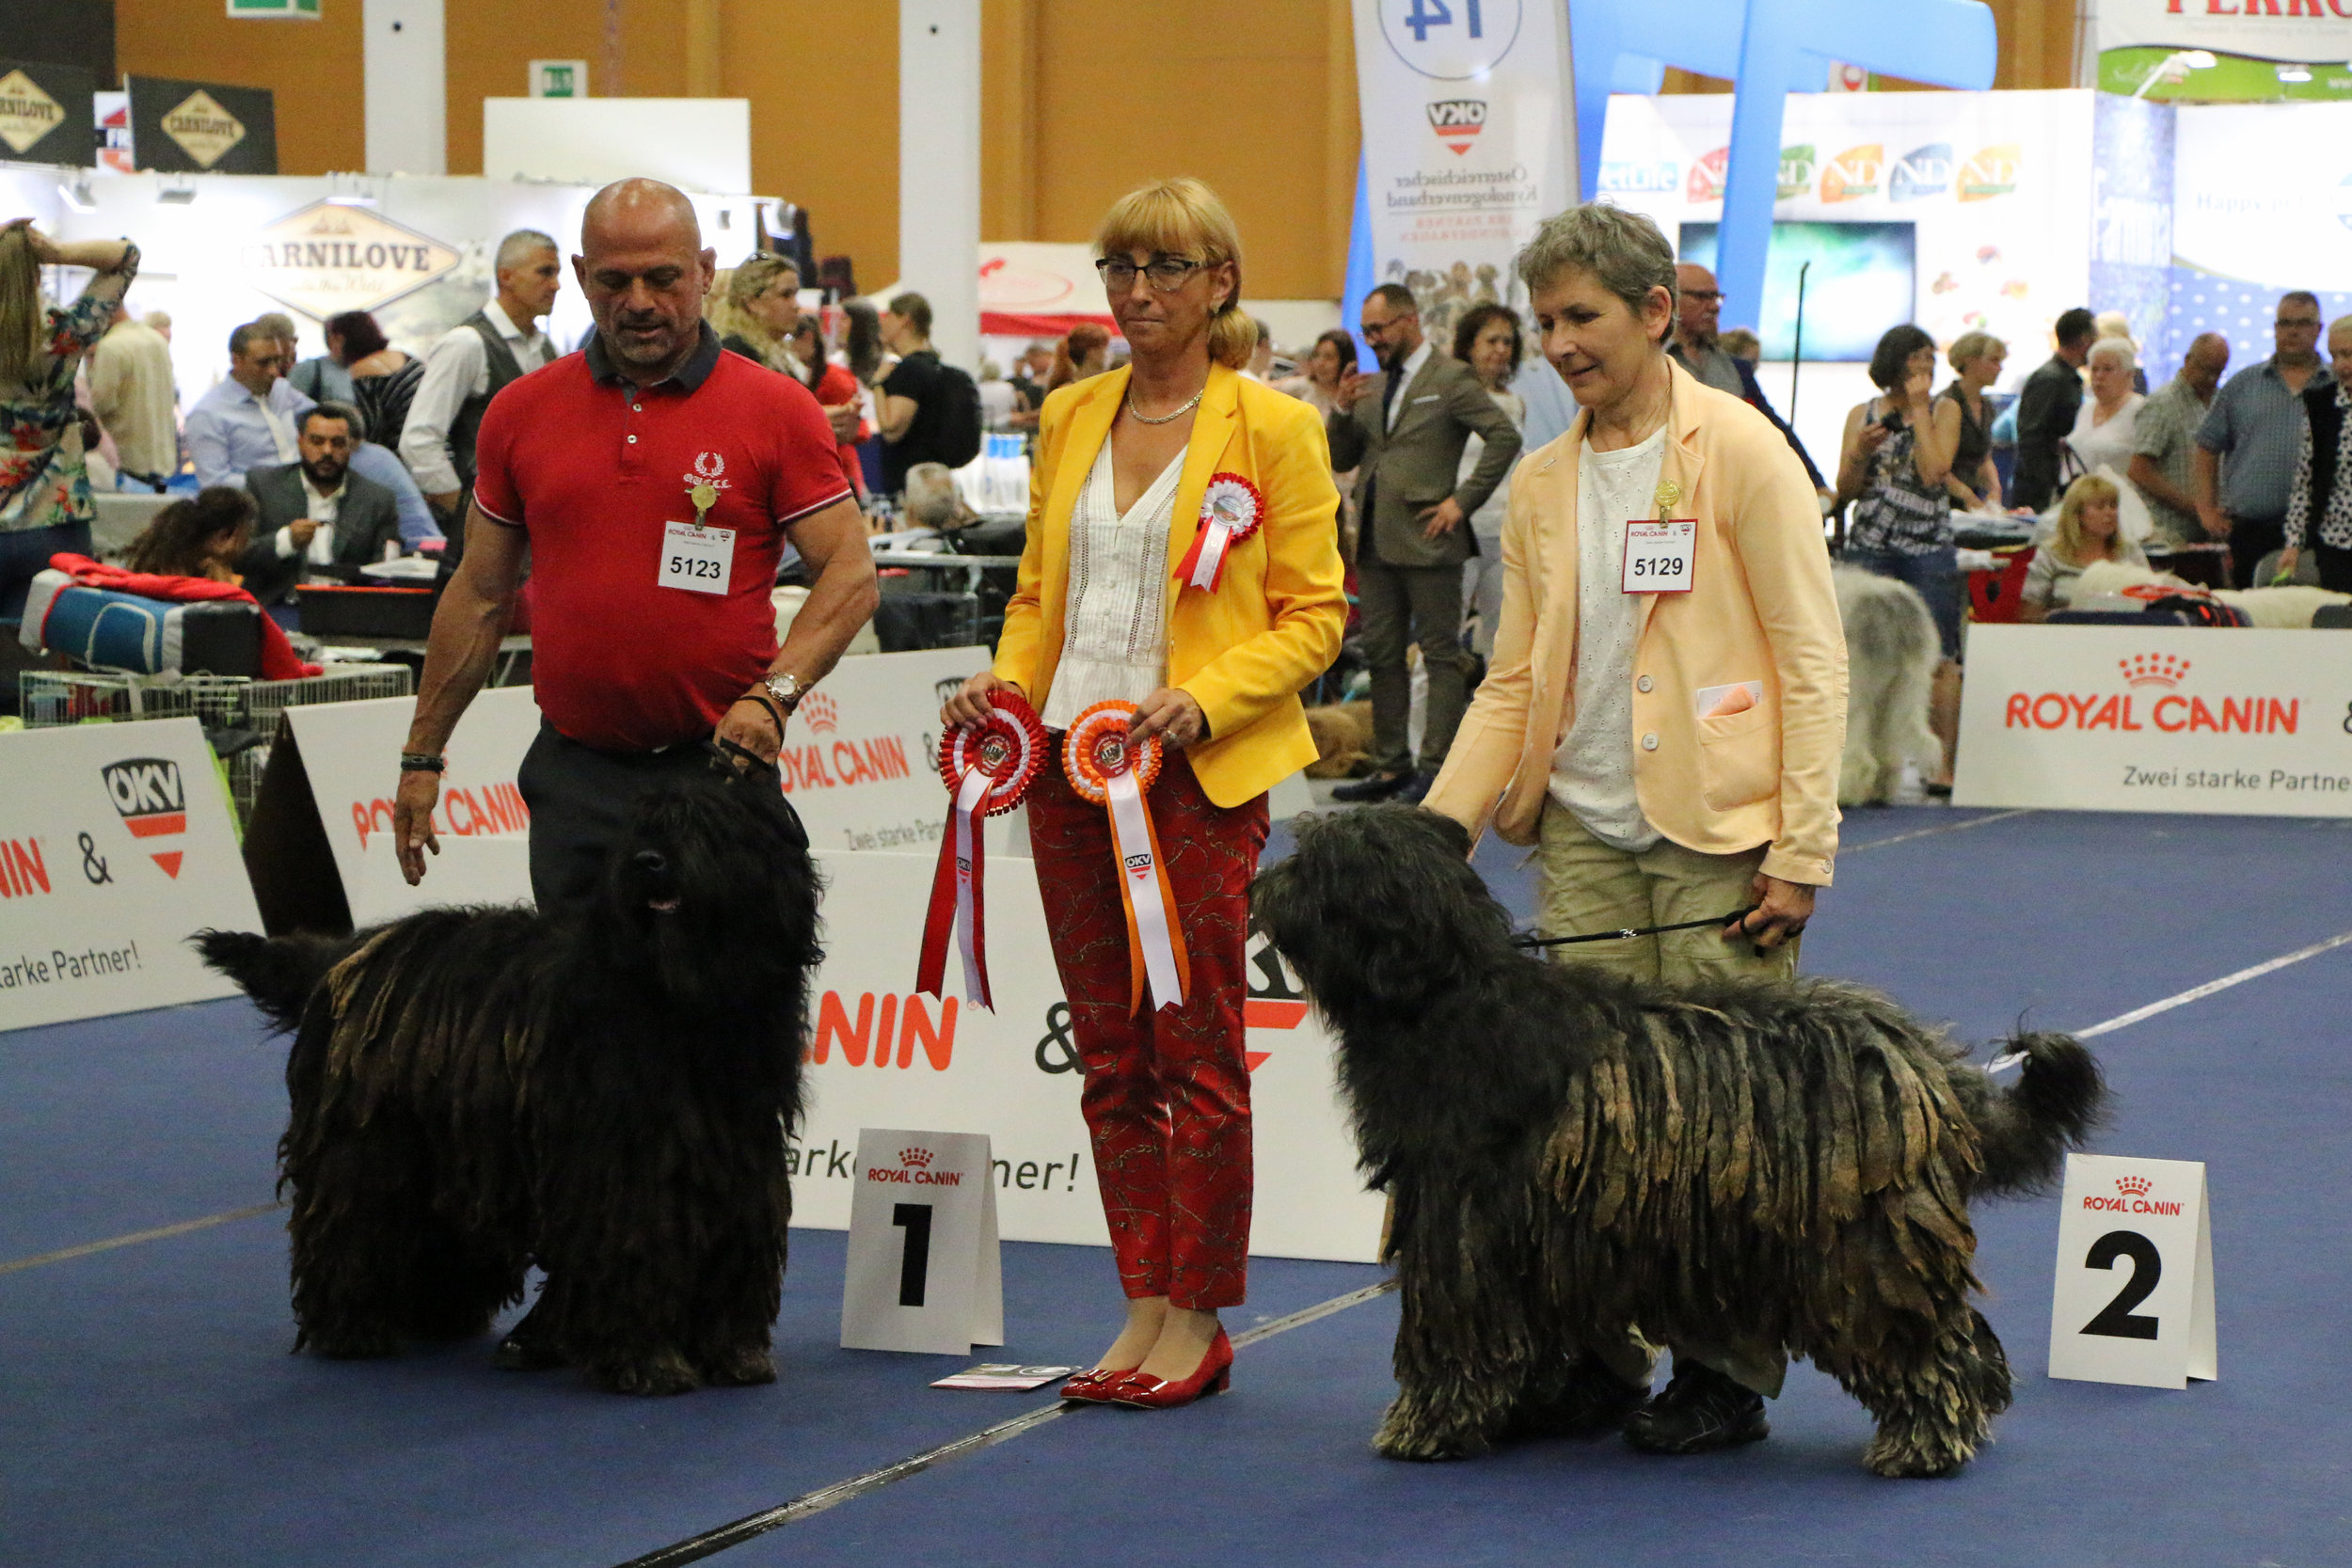 EUROPEAN WINNER, Ishtaran dei Lubercali and Iris dei Lupercali